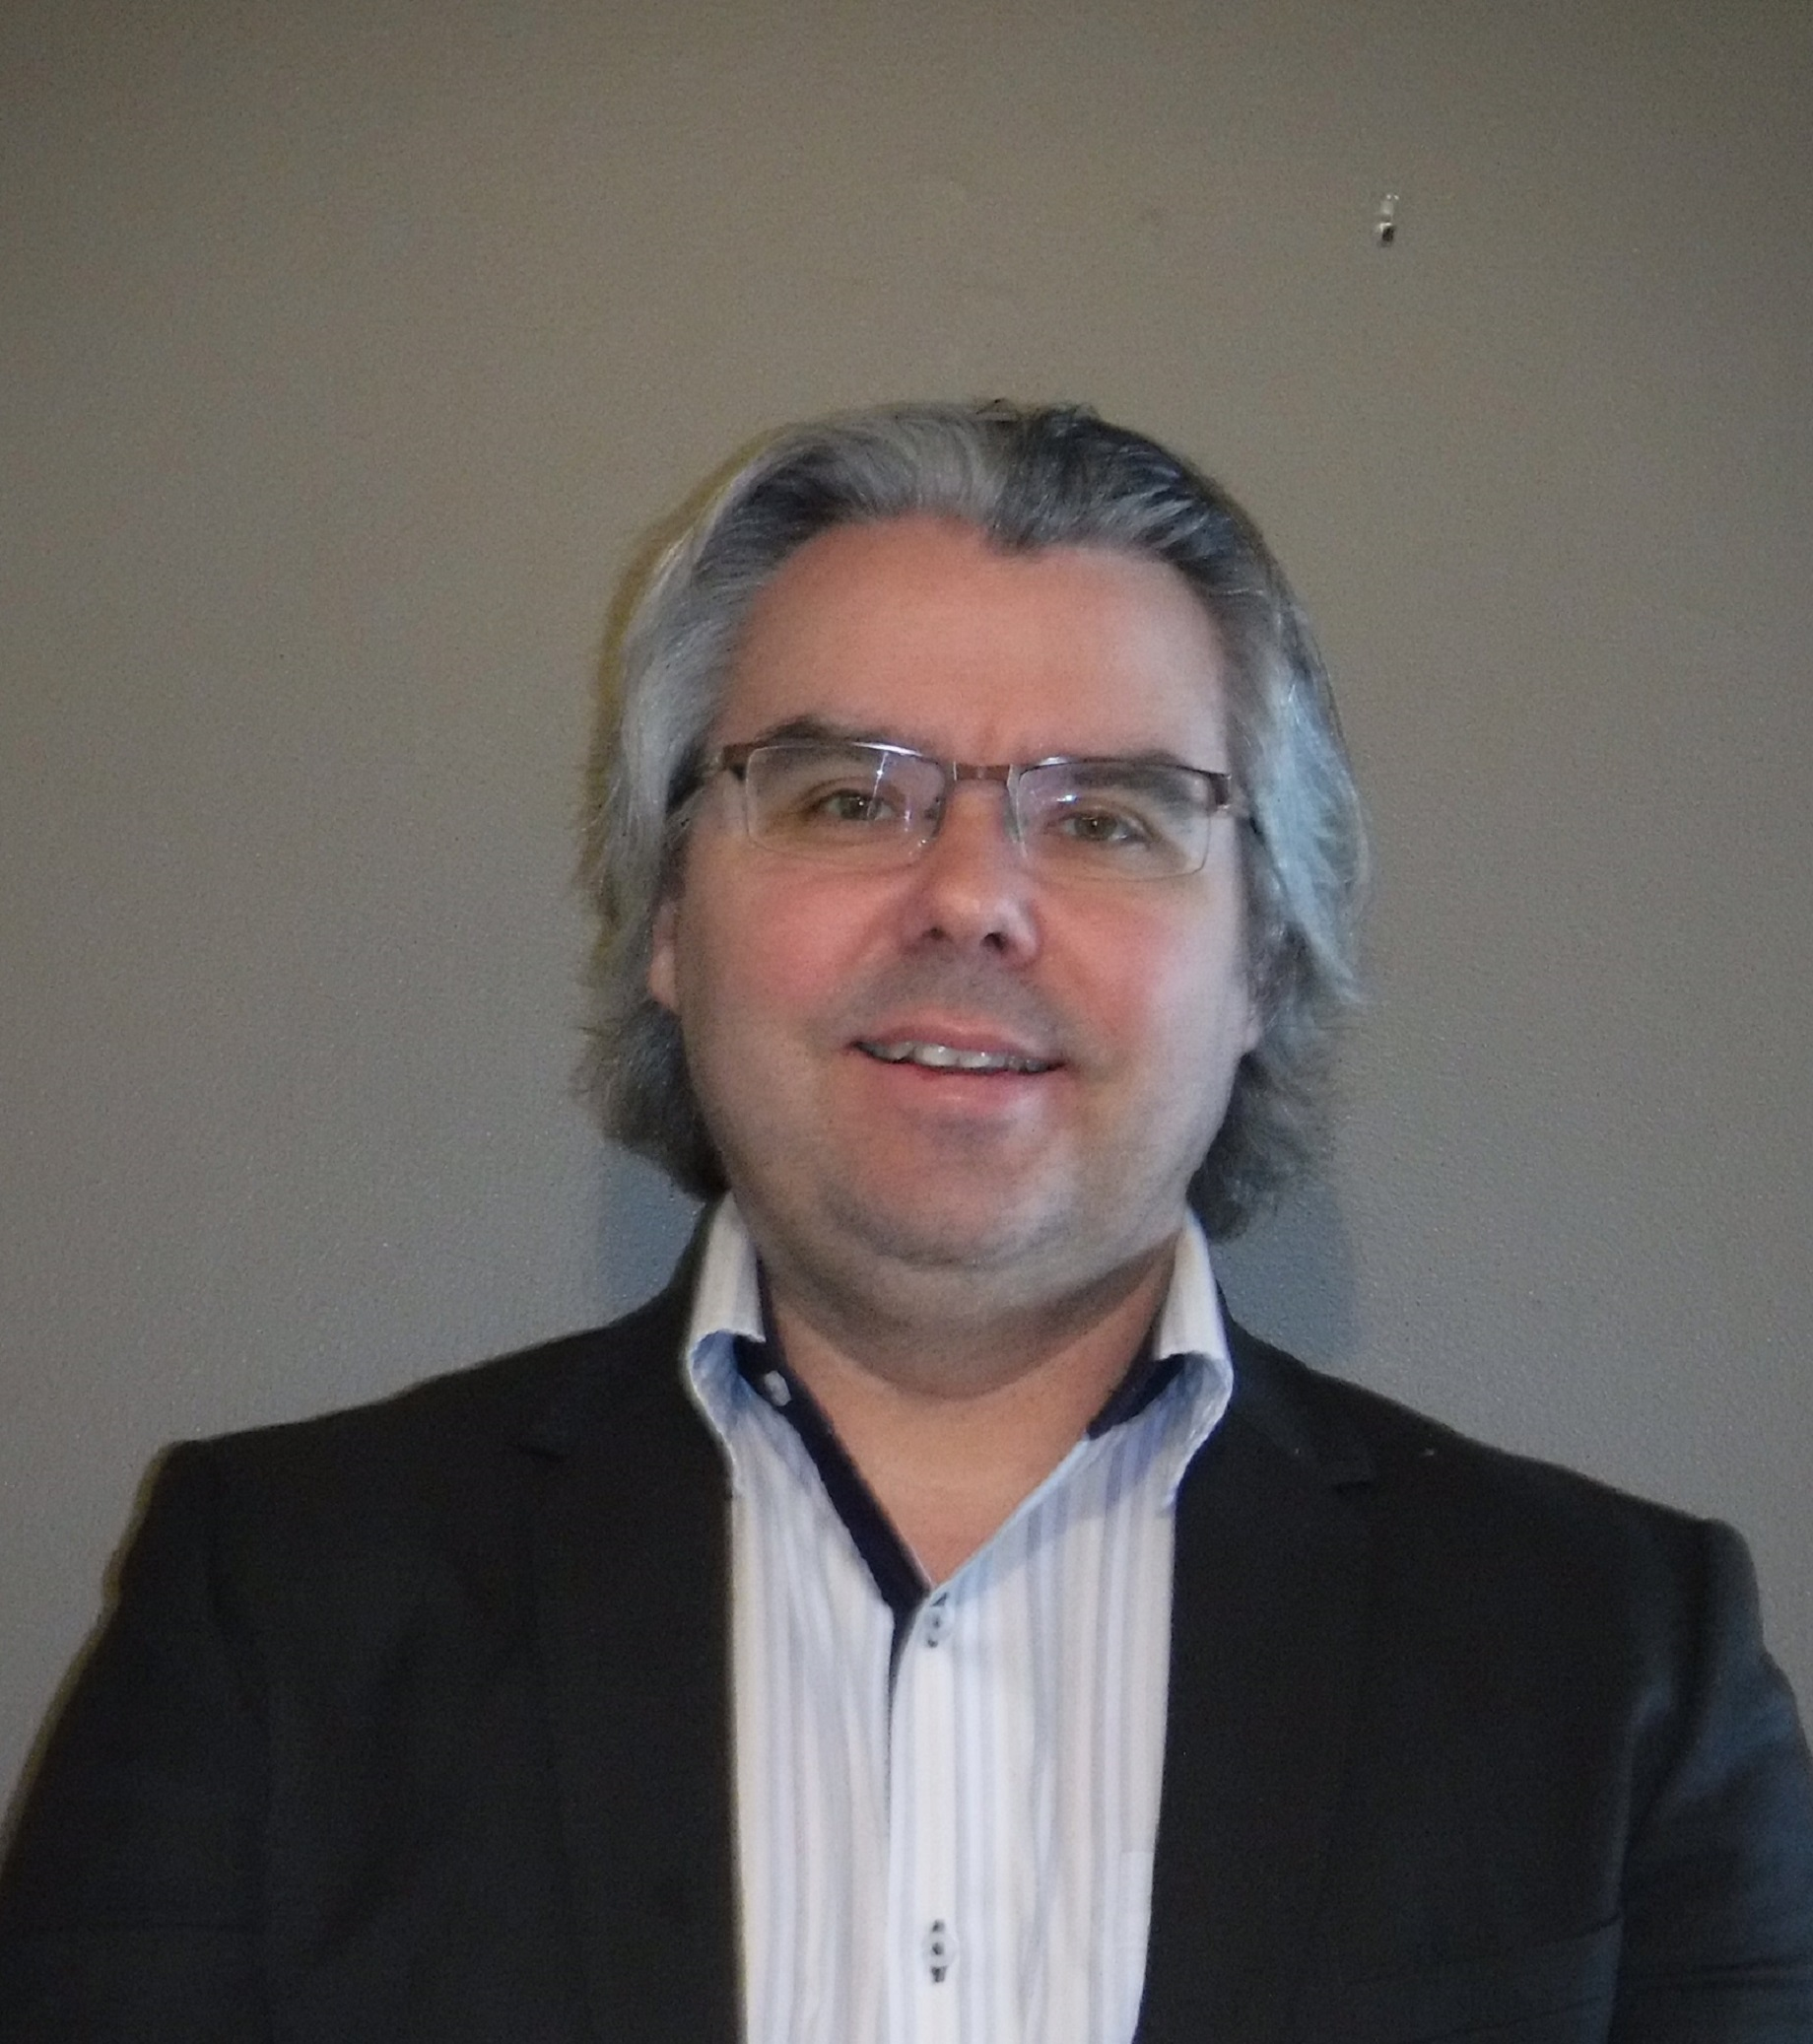 Christian Mercier